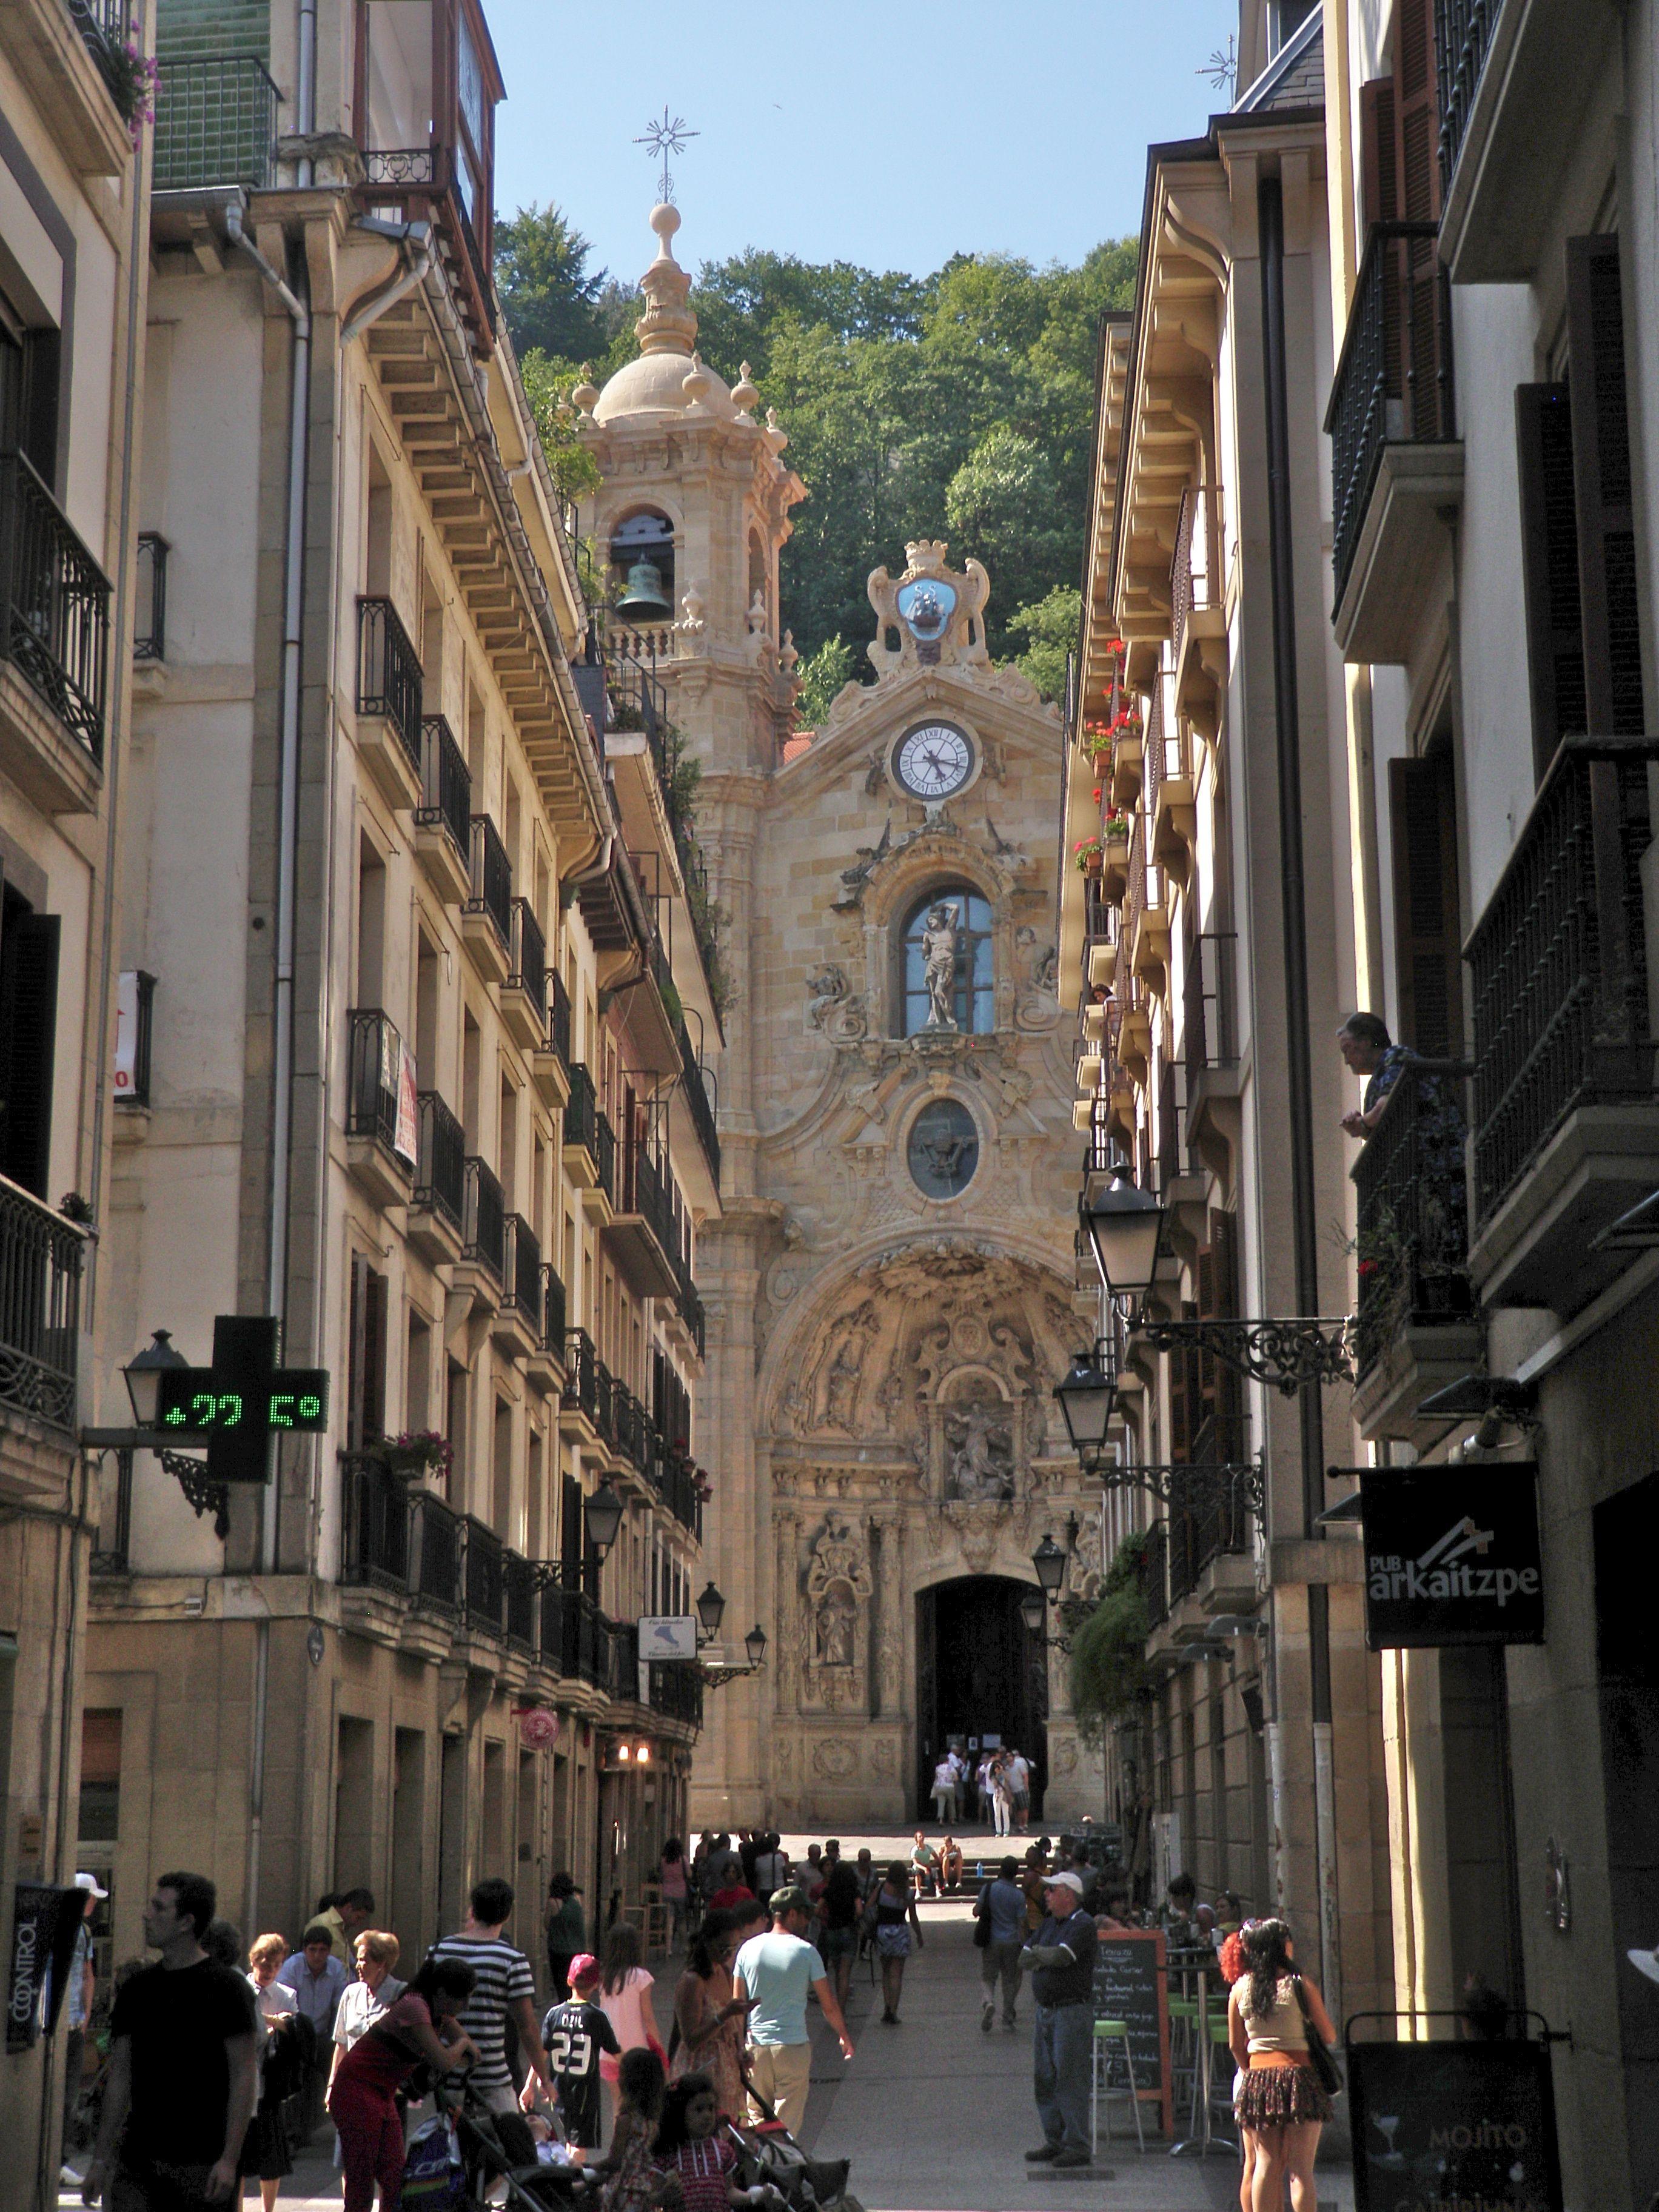 San sebasti n pa s vasco basque vascos pinterest - San sebastian pais vasco ...